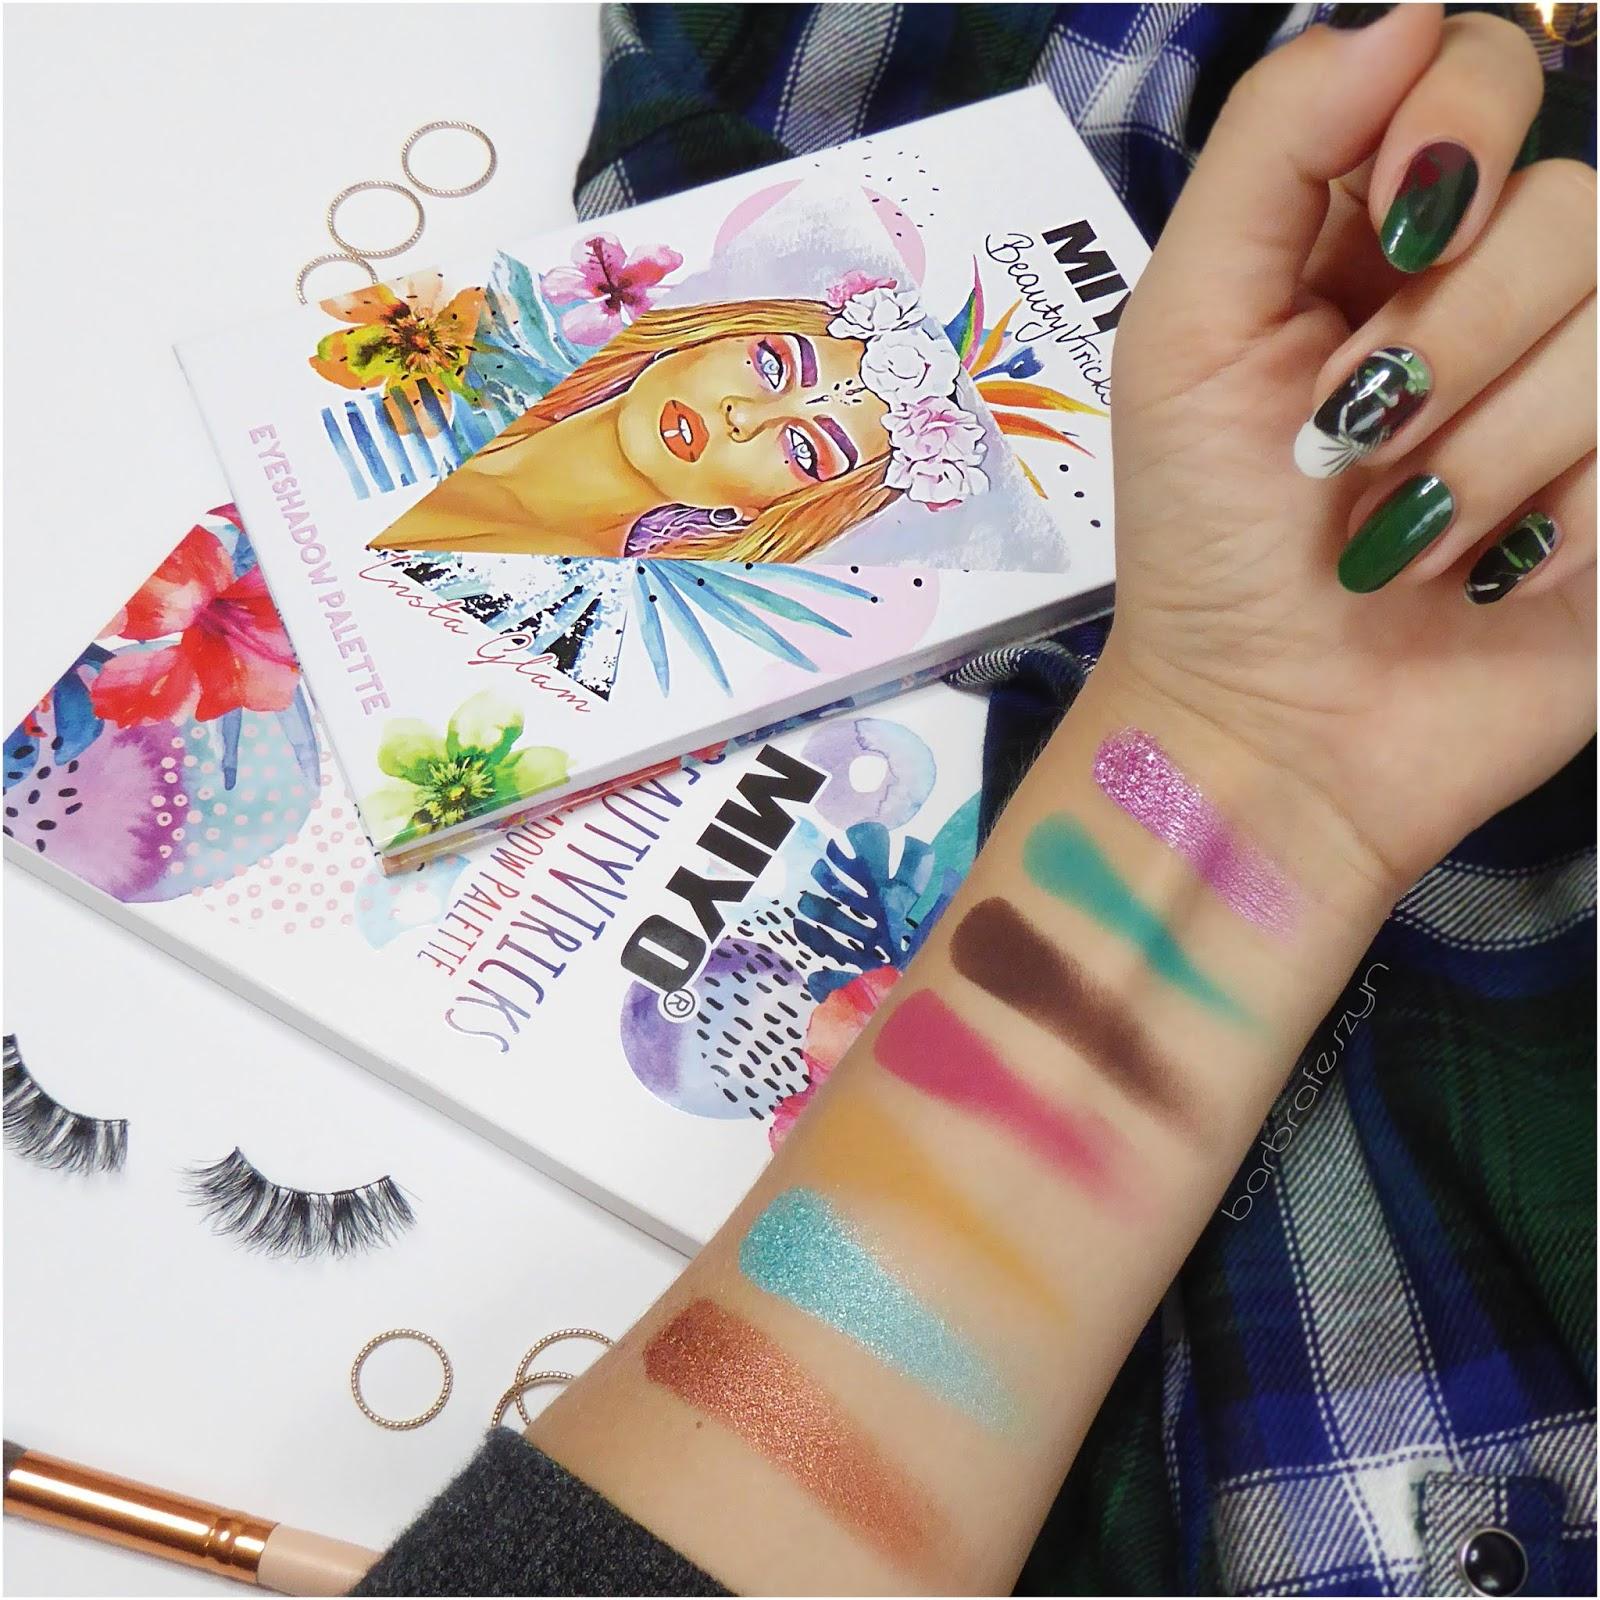 Miyo Beautyvtricks Insta Glam Barbrafeszyn Blog O Paznokciach